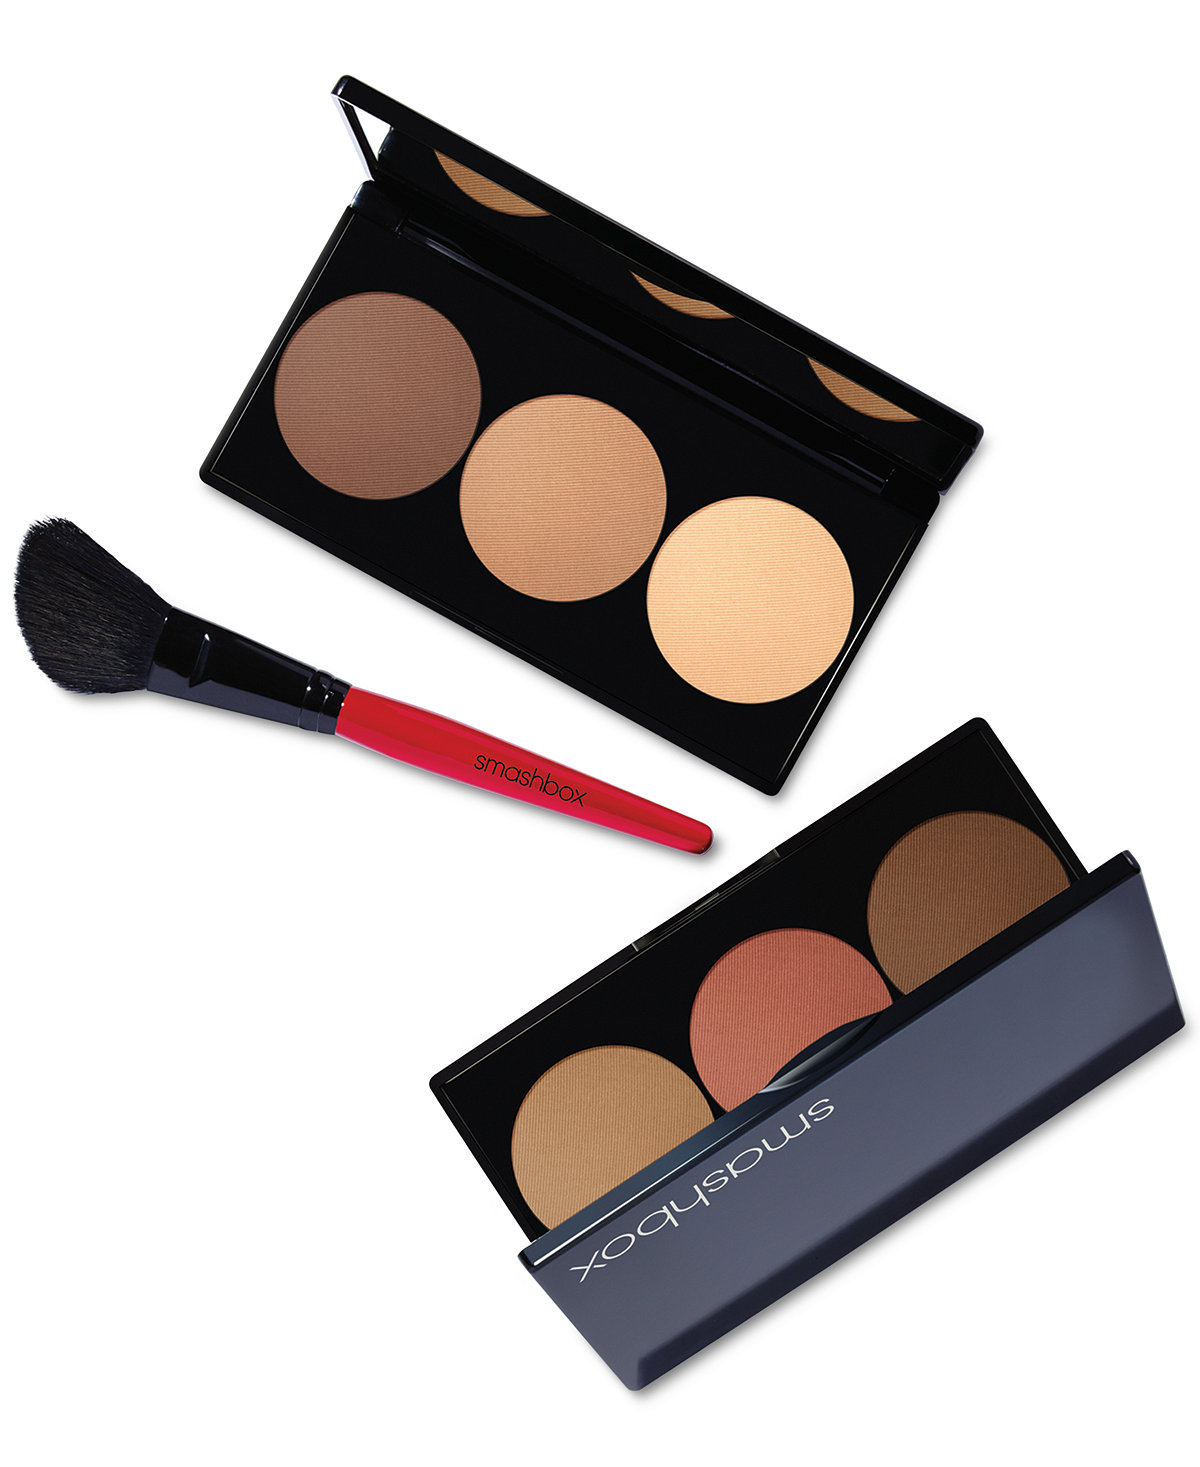 Macys: $21 (Reg. $45) + Get $5 Macy's Money Smashbox Cosmetics Smashbox Step-By-Step Contour Kit + Free Ship!